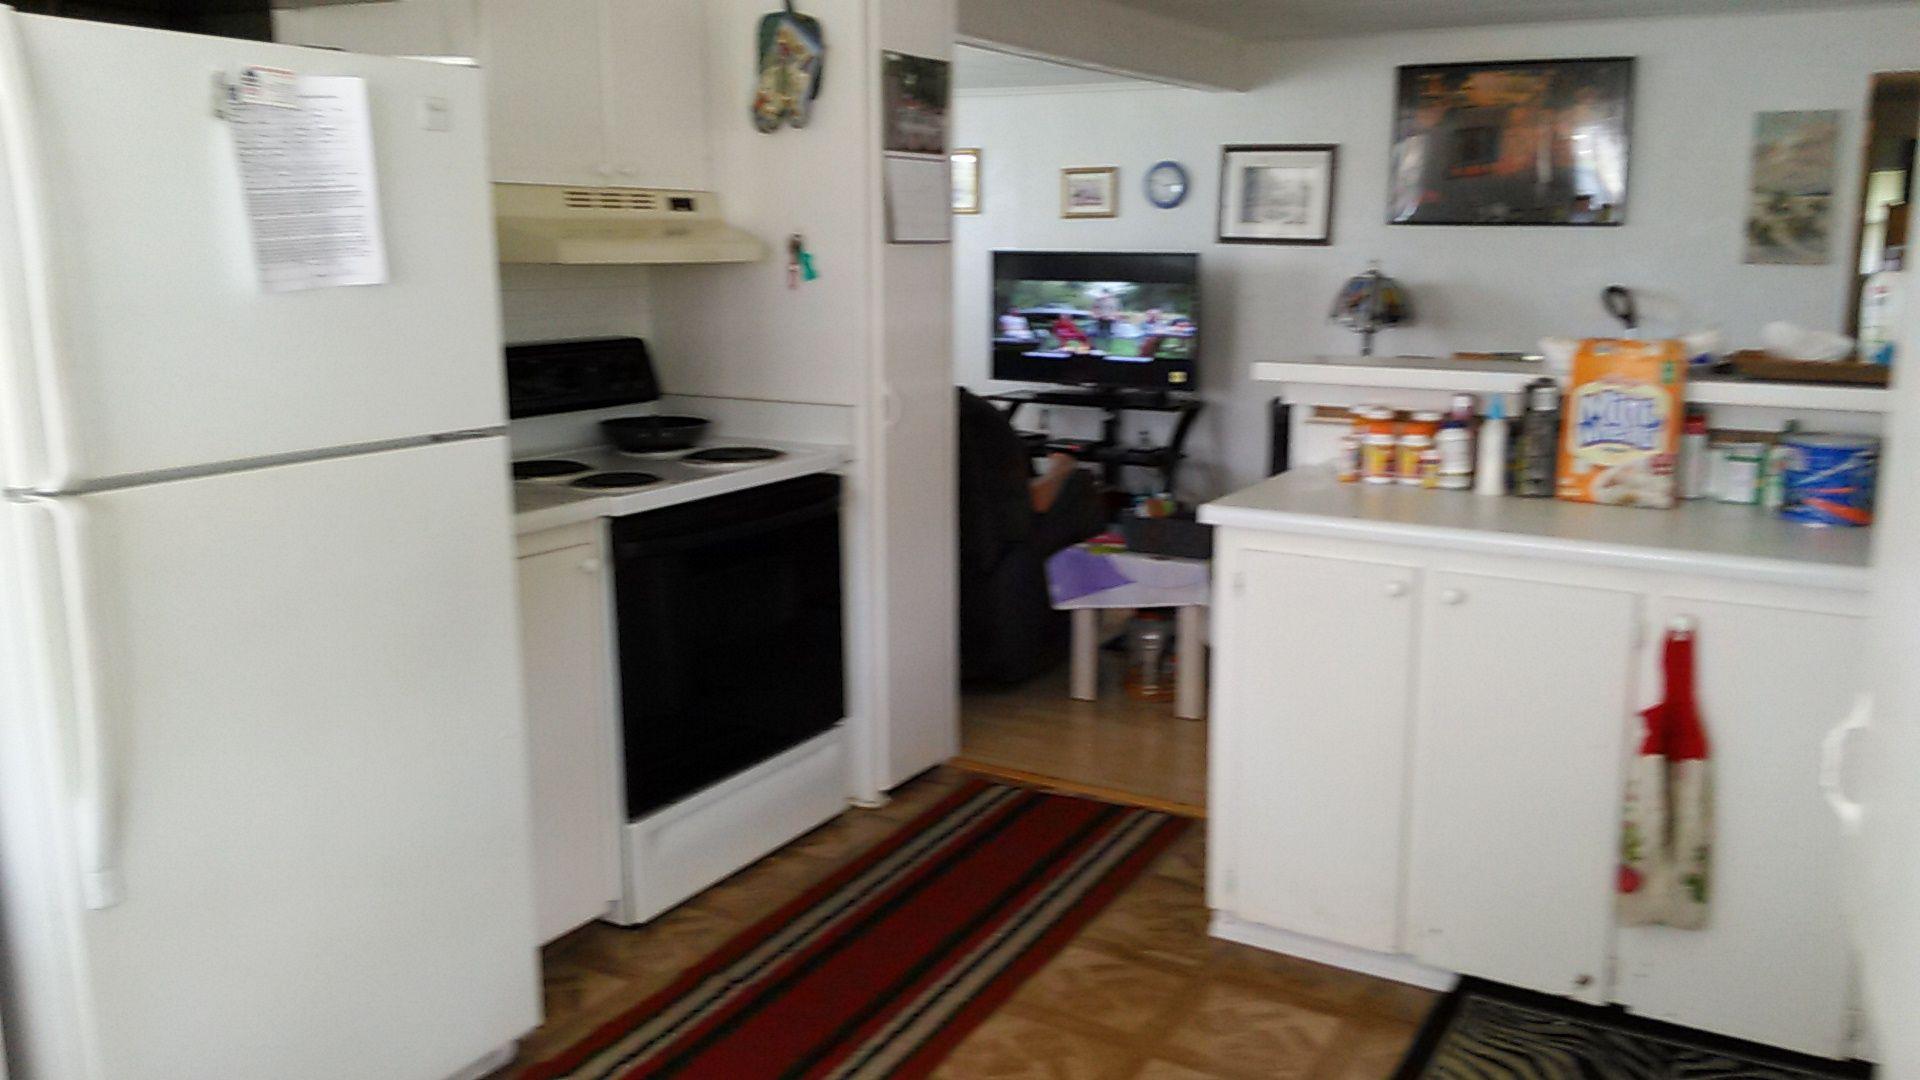 Sunh Mobile Home For Sale In Pinellas Park Fl 33781 Mobile Homes For Sale Home Ideal Home